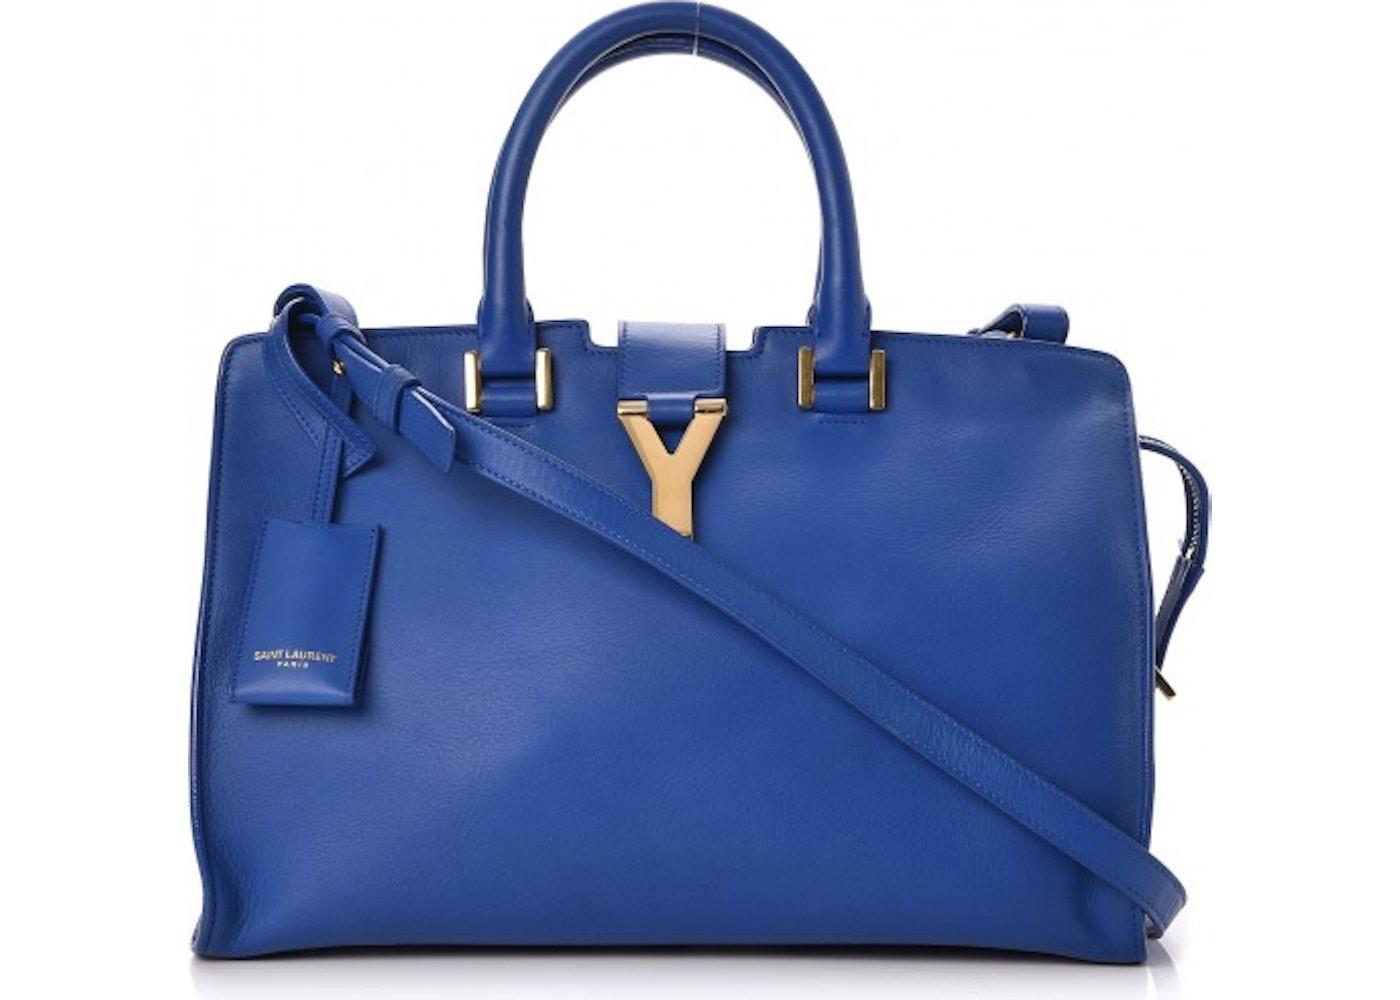 97540b0e07 Saint Laurent Classic Y Cabas Small Royal Blue. Small Royal Blue